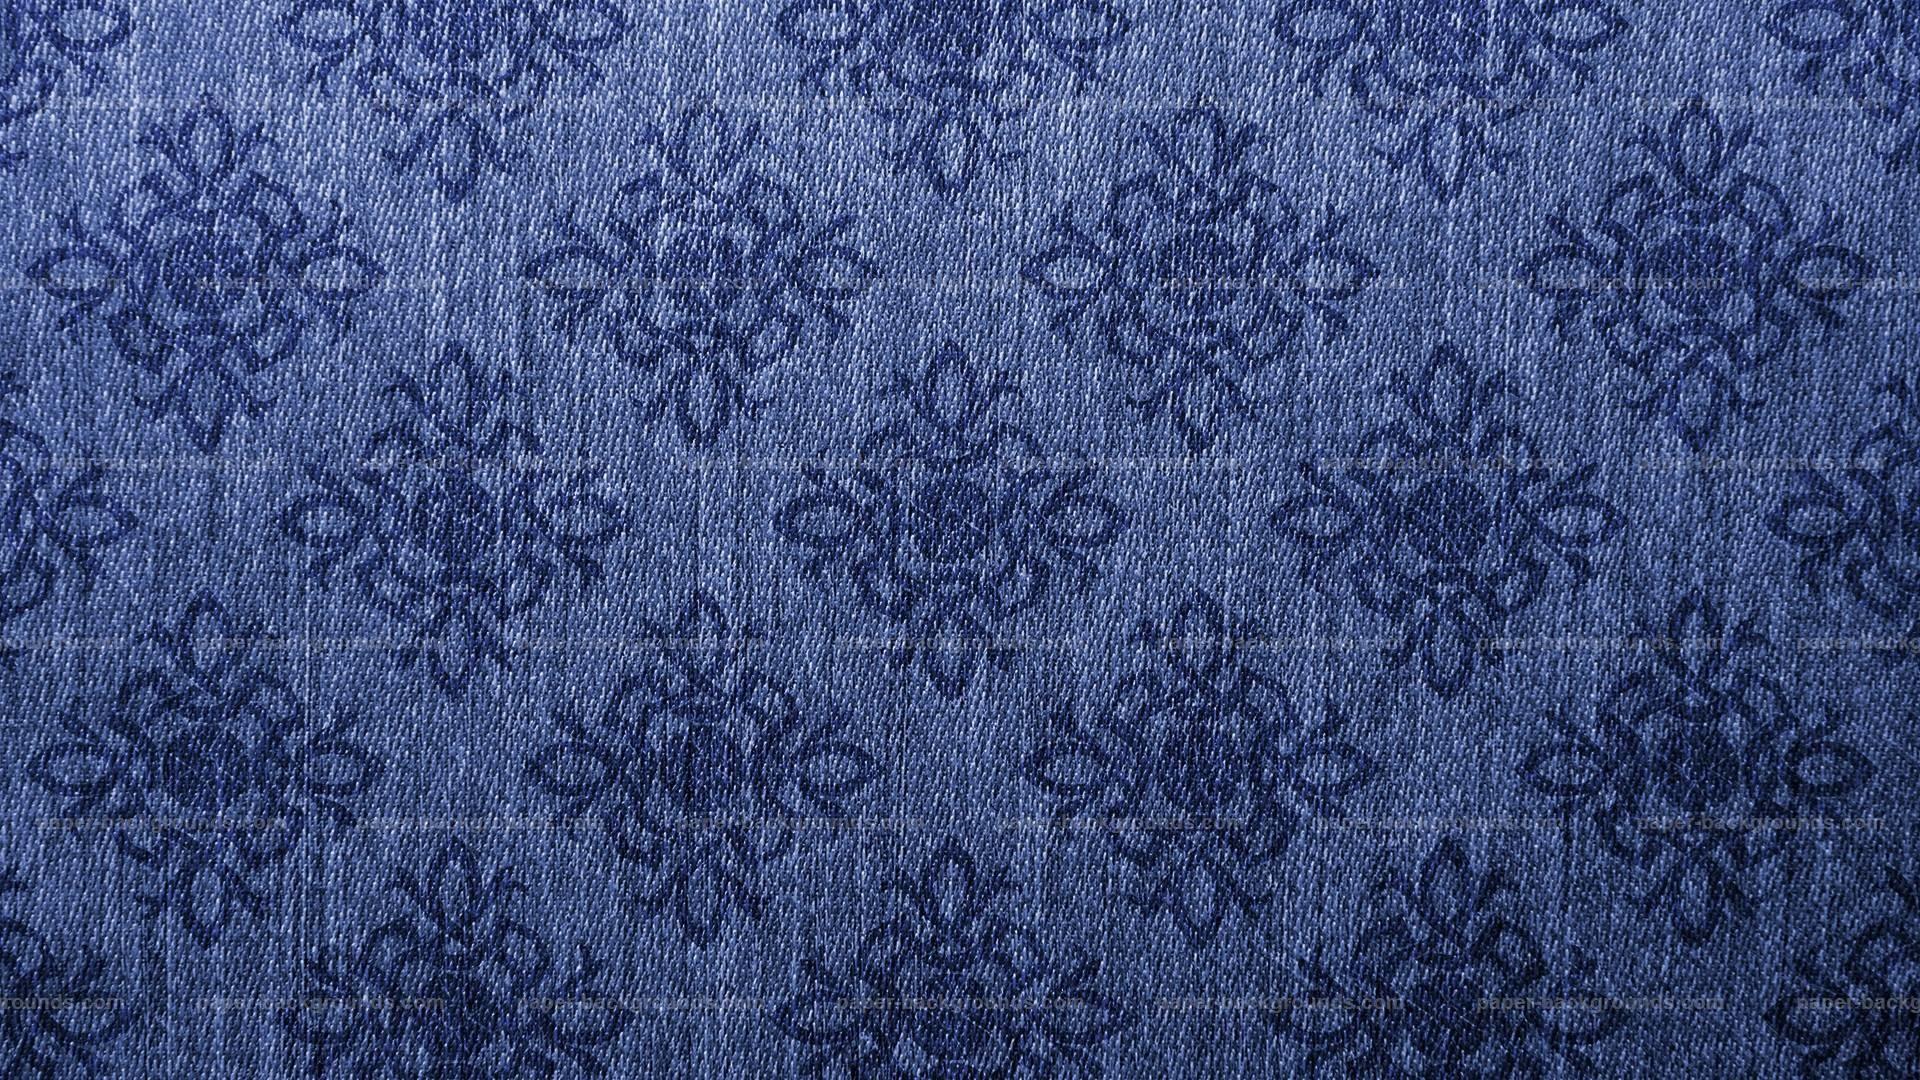 Res: 1920x1080, Blue Texture Backgrounds Hd Wallpaper